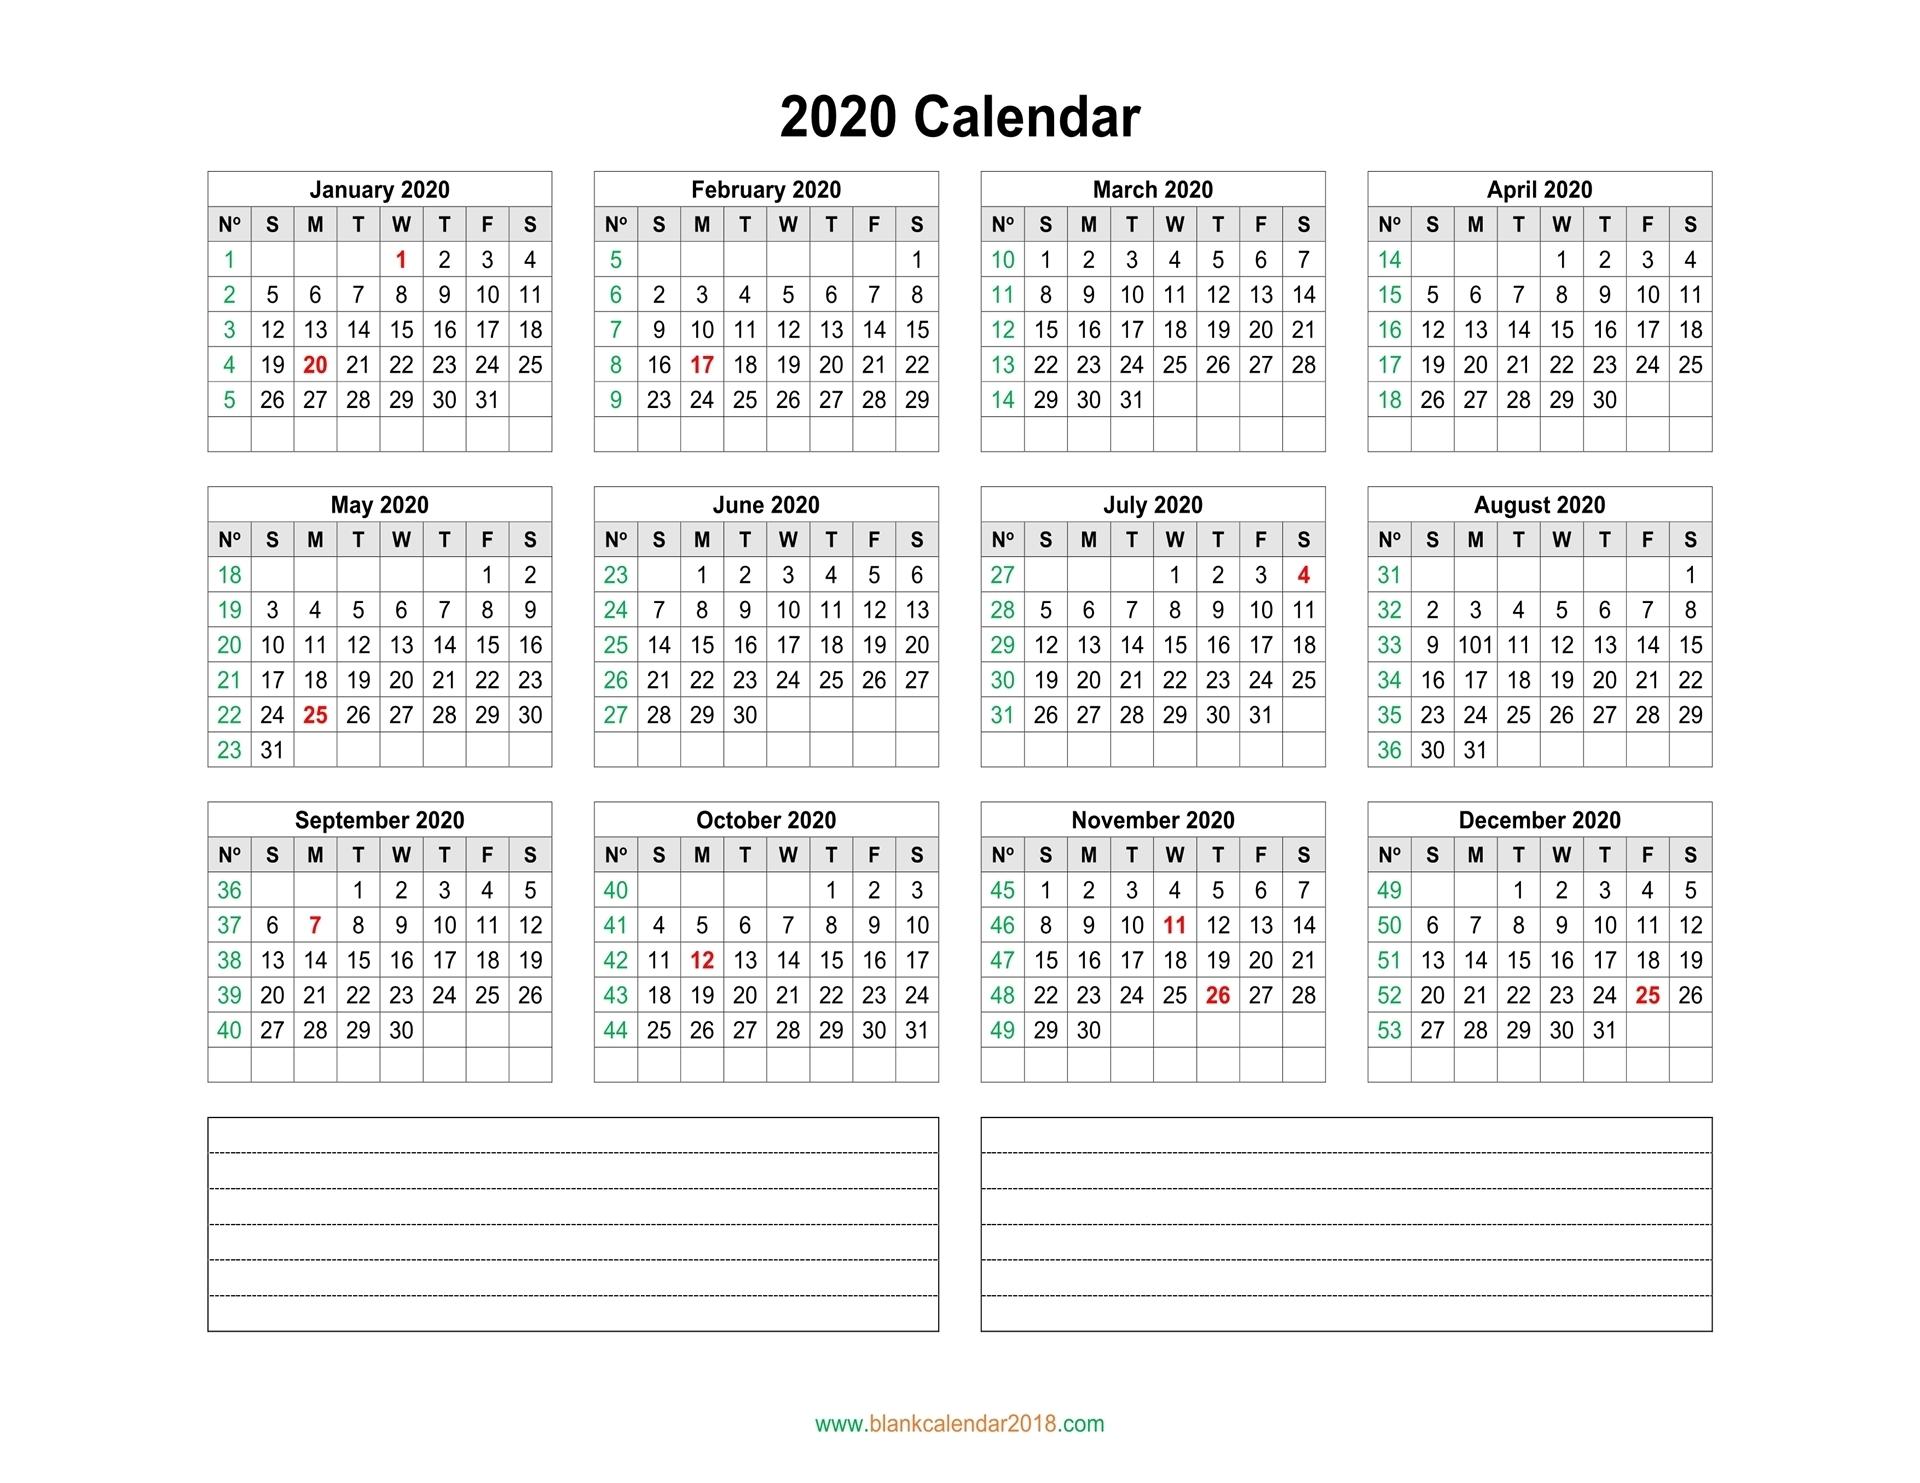 Blank Calendar 2020 in At A Glance Downloadable 2020 Calendar